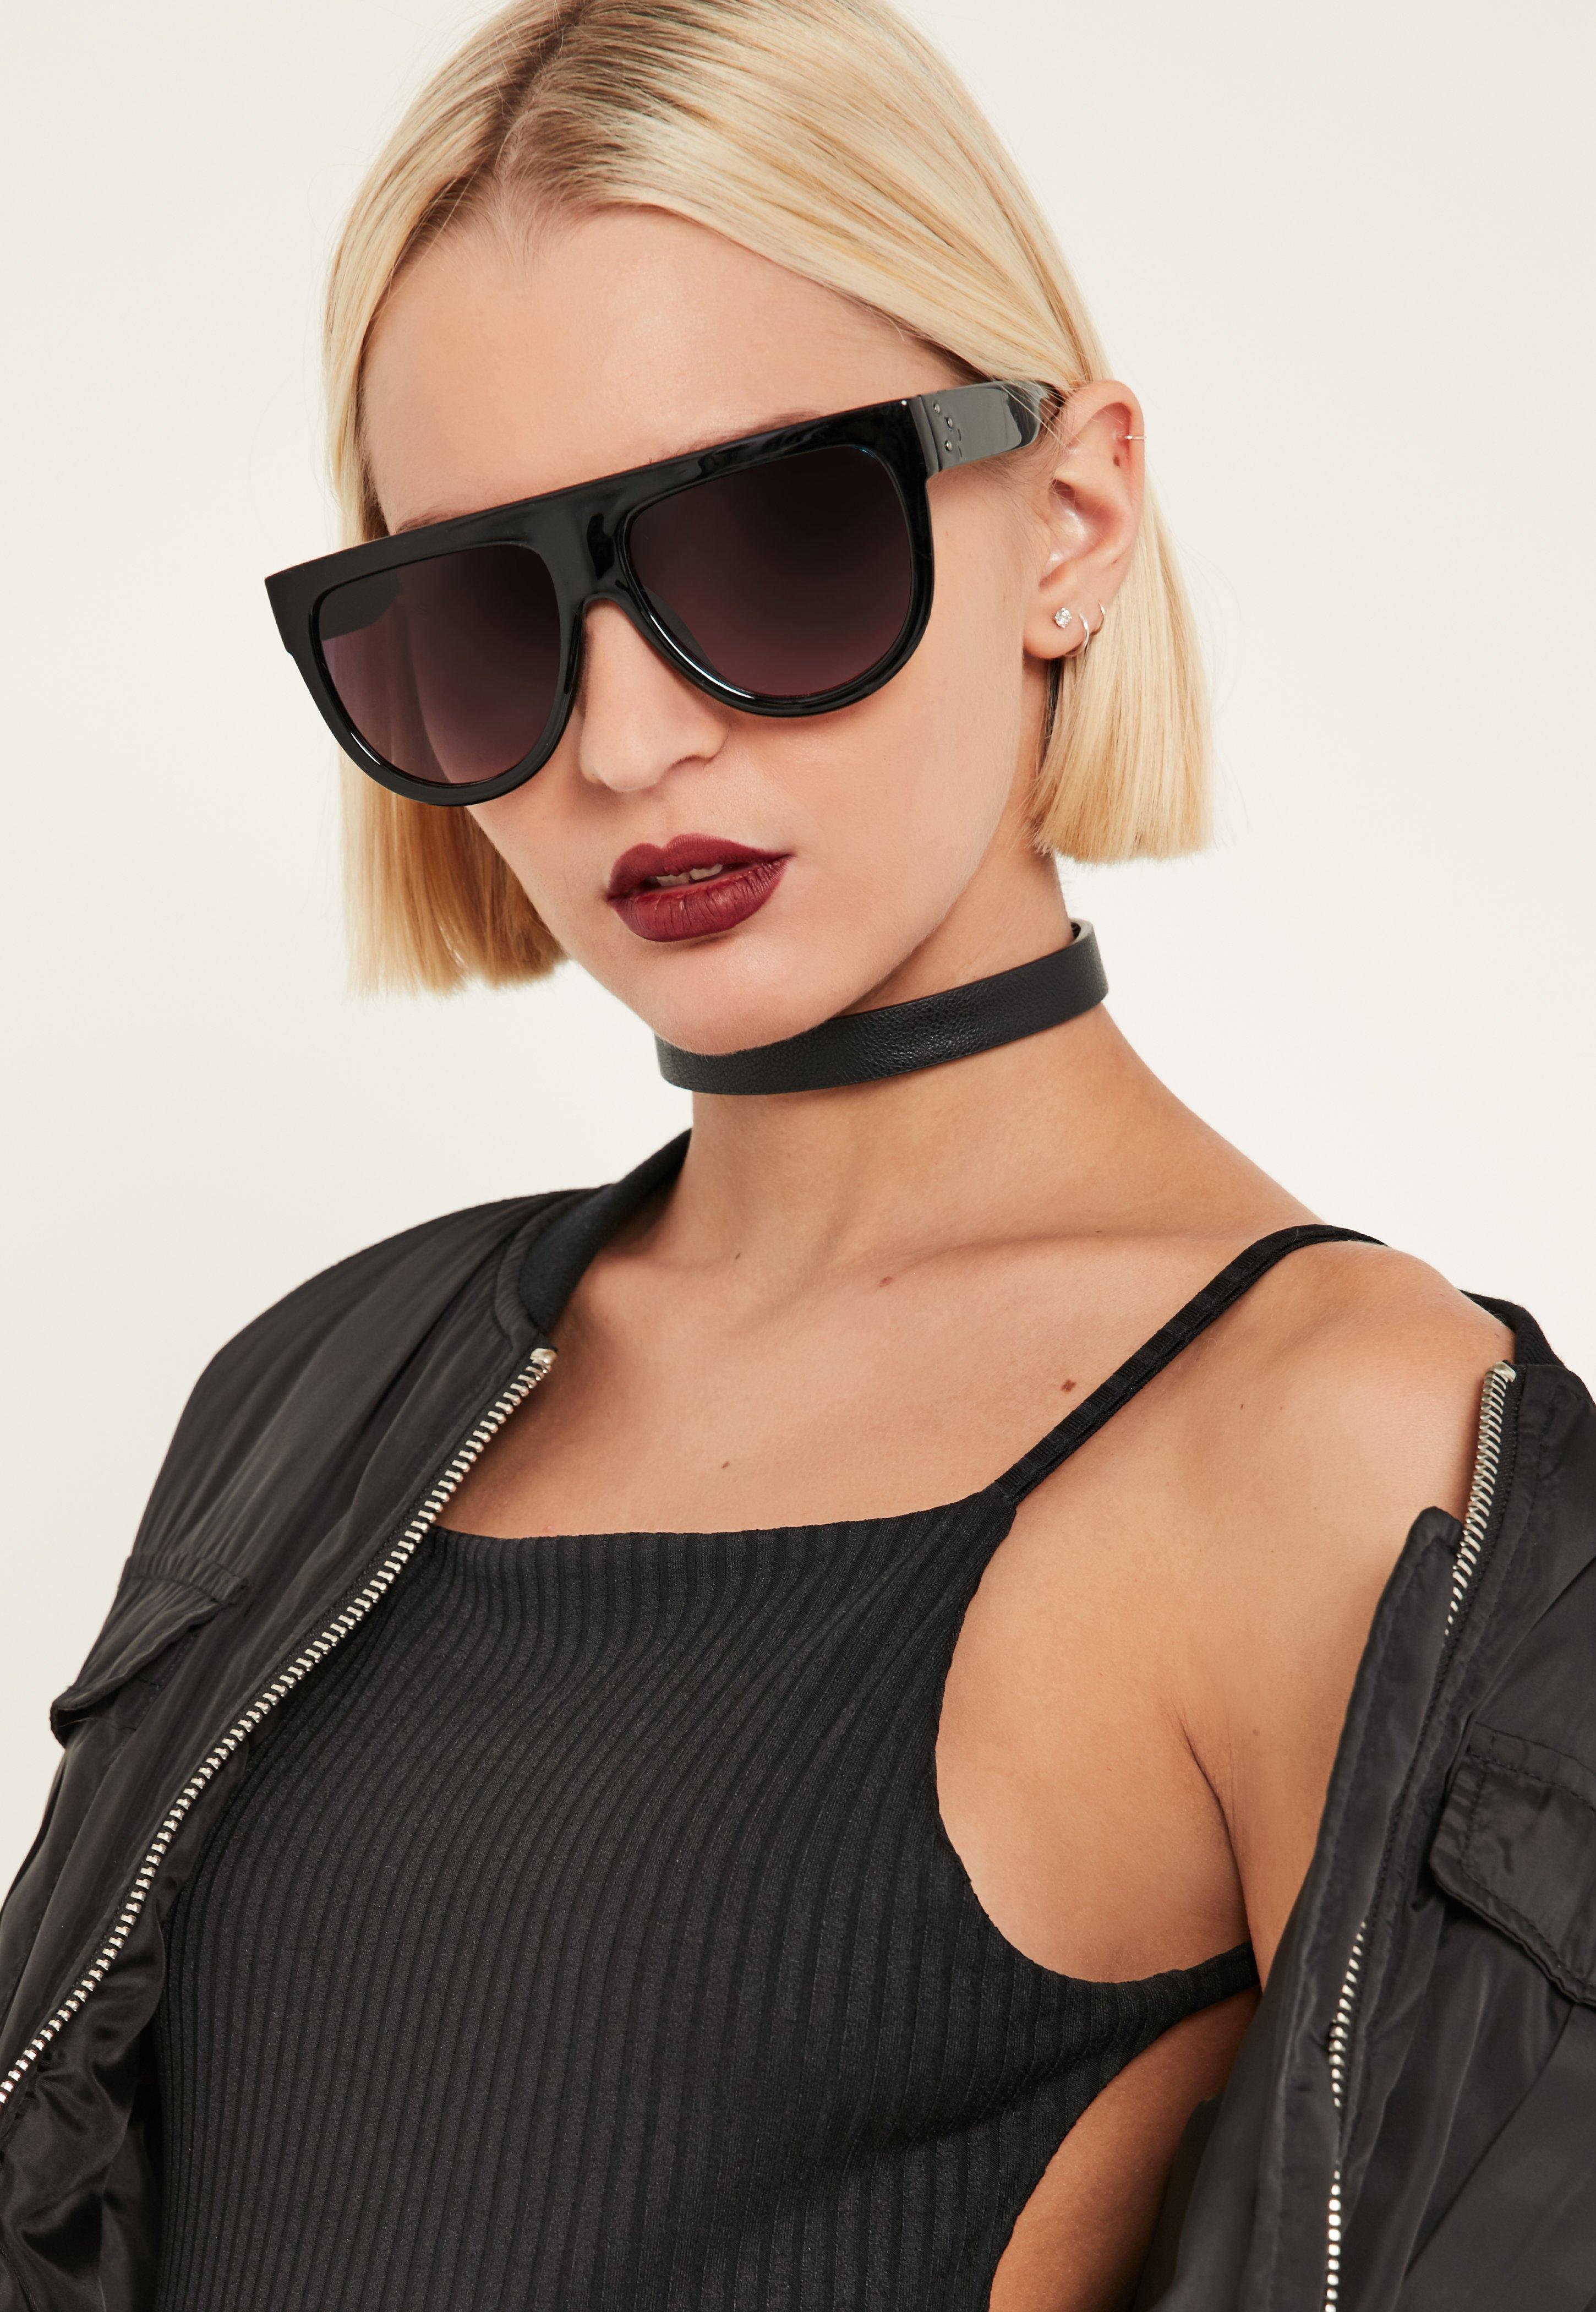 3b6265250d5 Lyst - Missguided Black Flat Top Sunglasses in Black